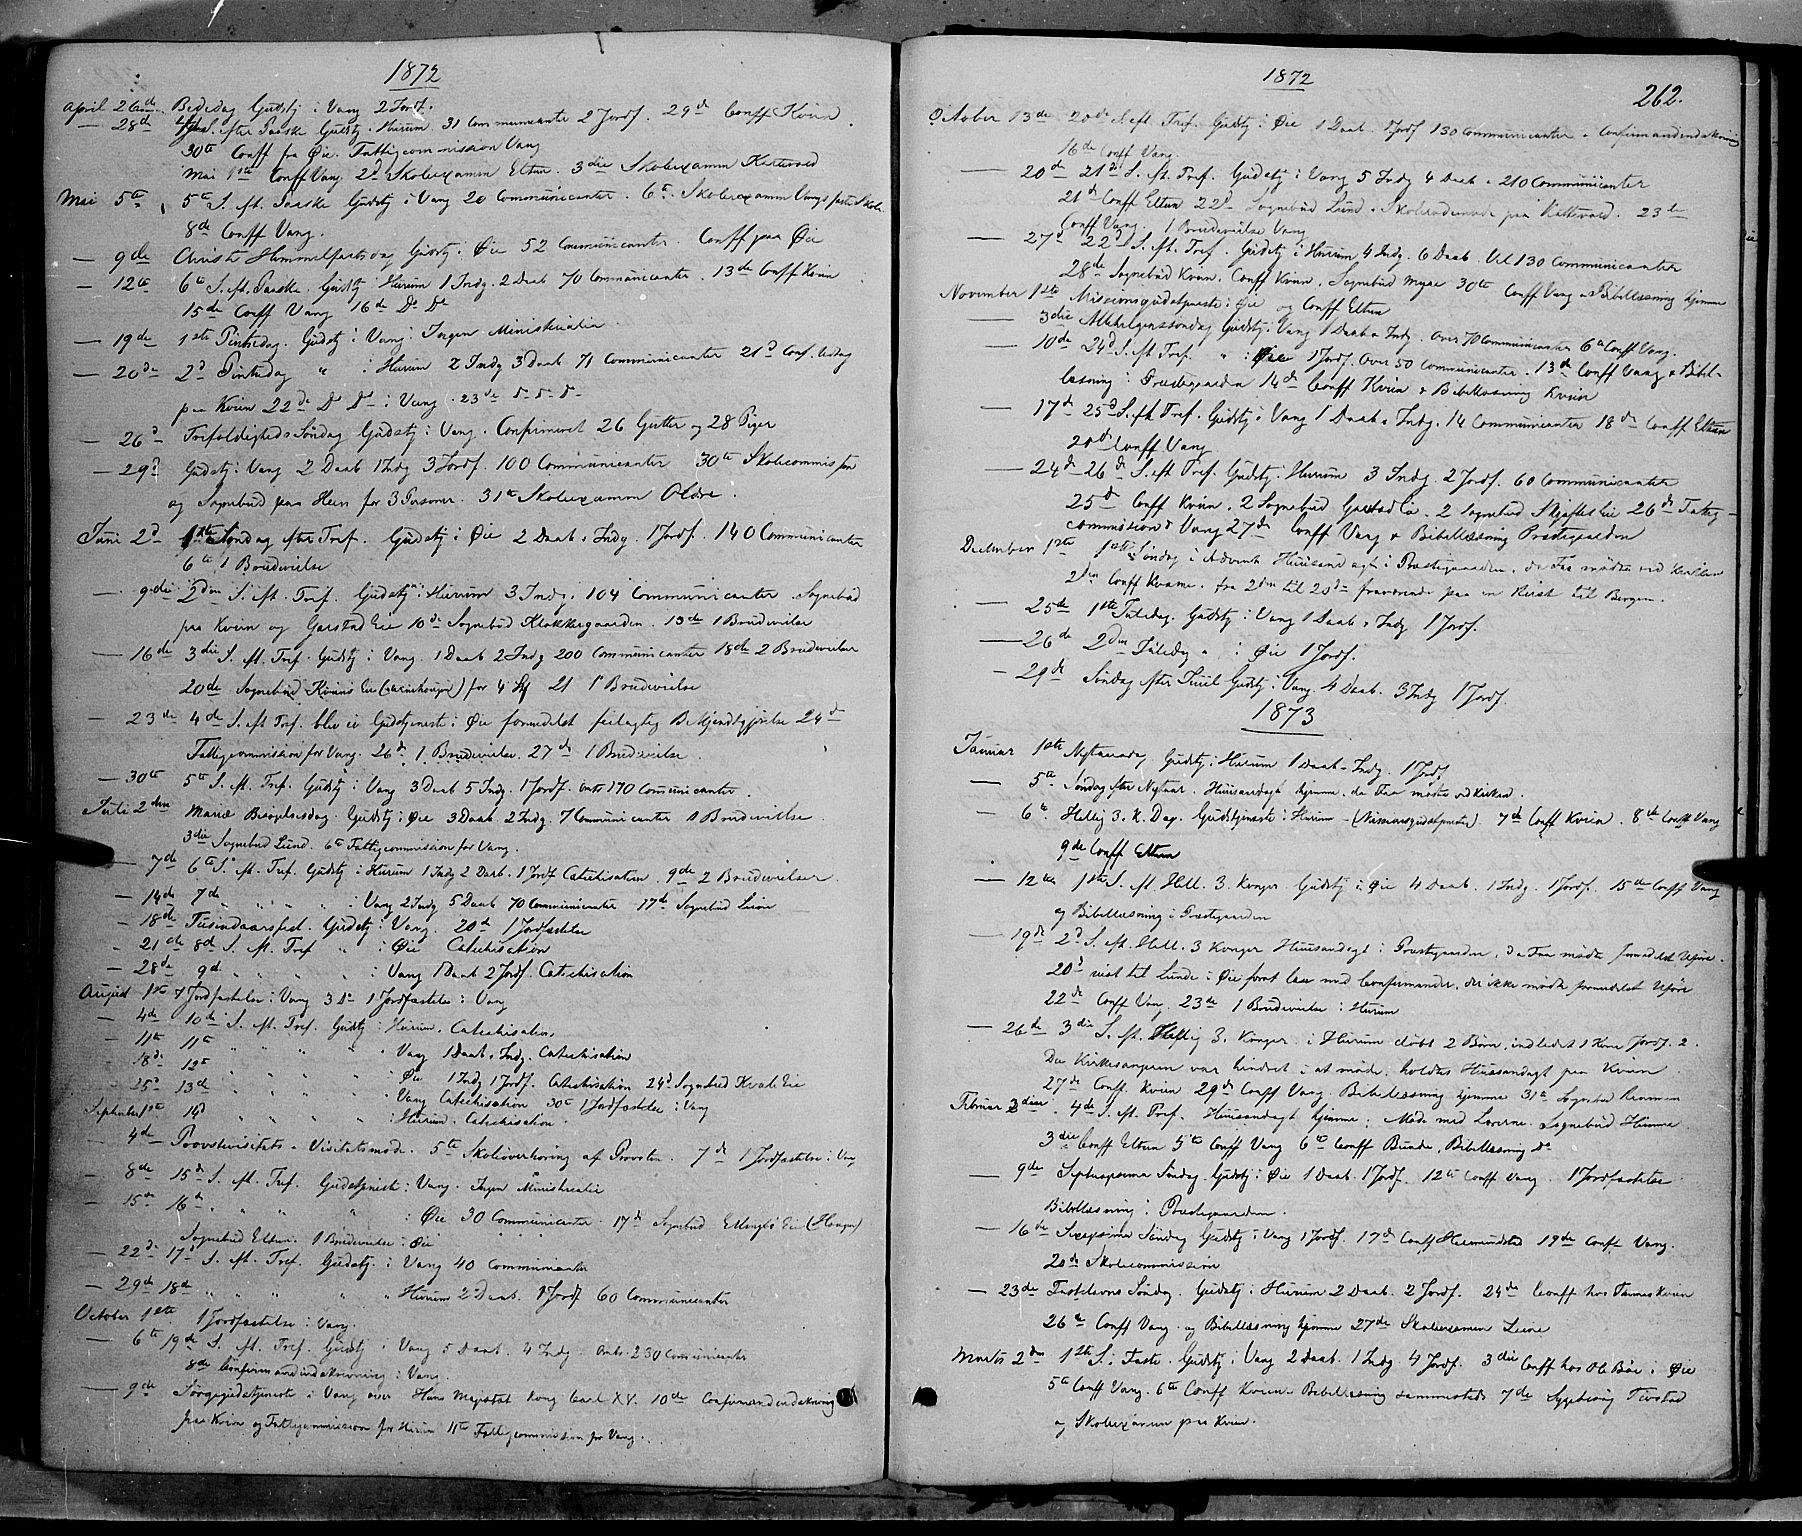 SAH, Vang prestekontor, Valdres, Ministerialbok nr. 7, 1865-1881, s. 262b